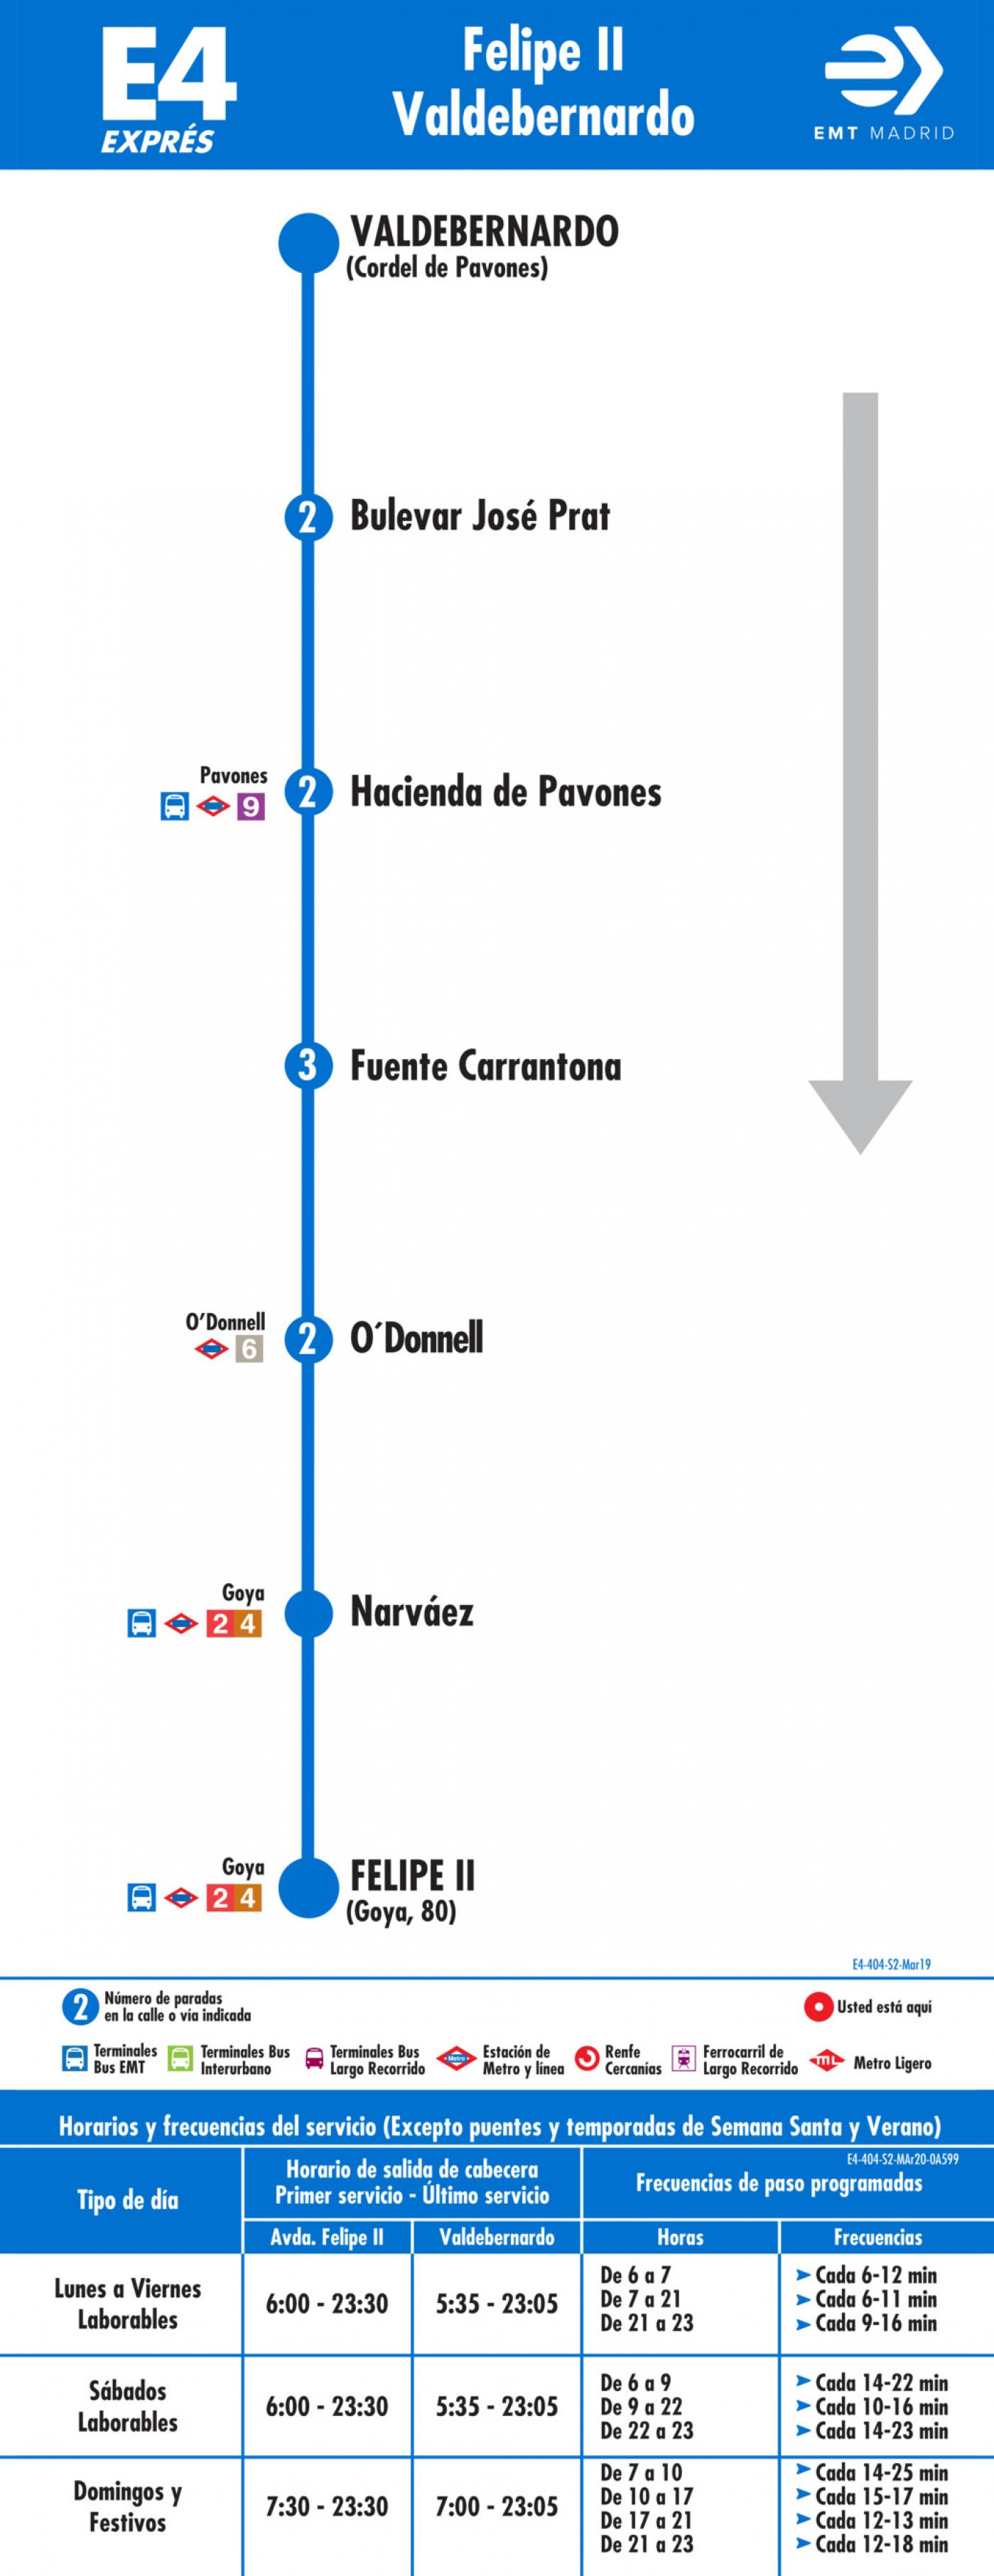 Tabla de horarios y frecuencias de paso en sentido vuelta Línea E4: Avenida de Felipe II - Valdebernardo